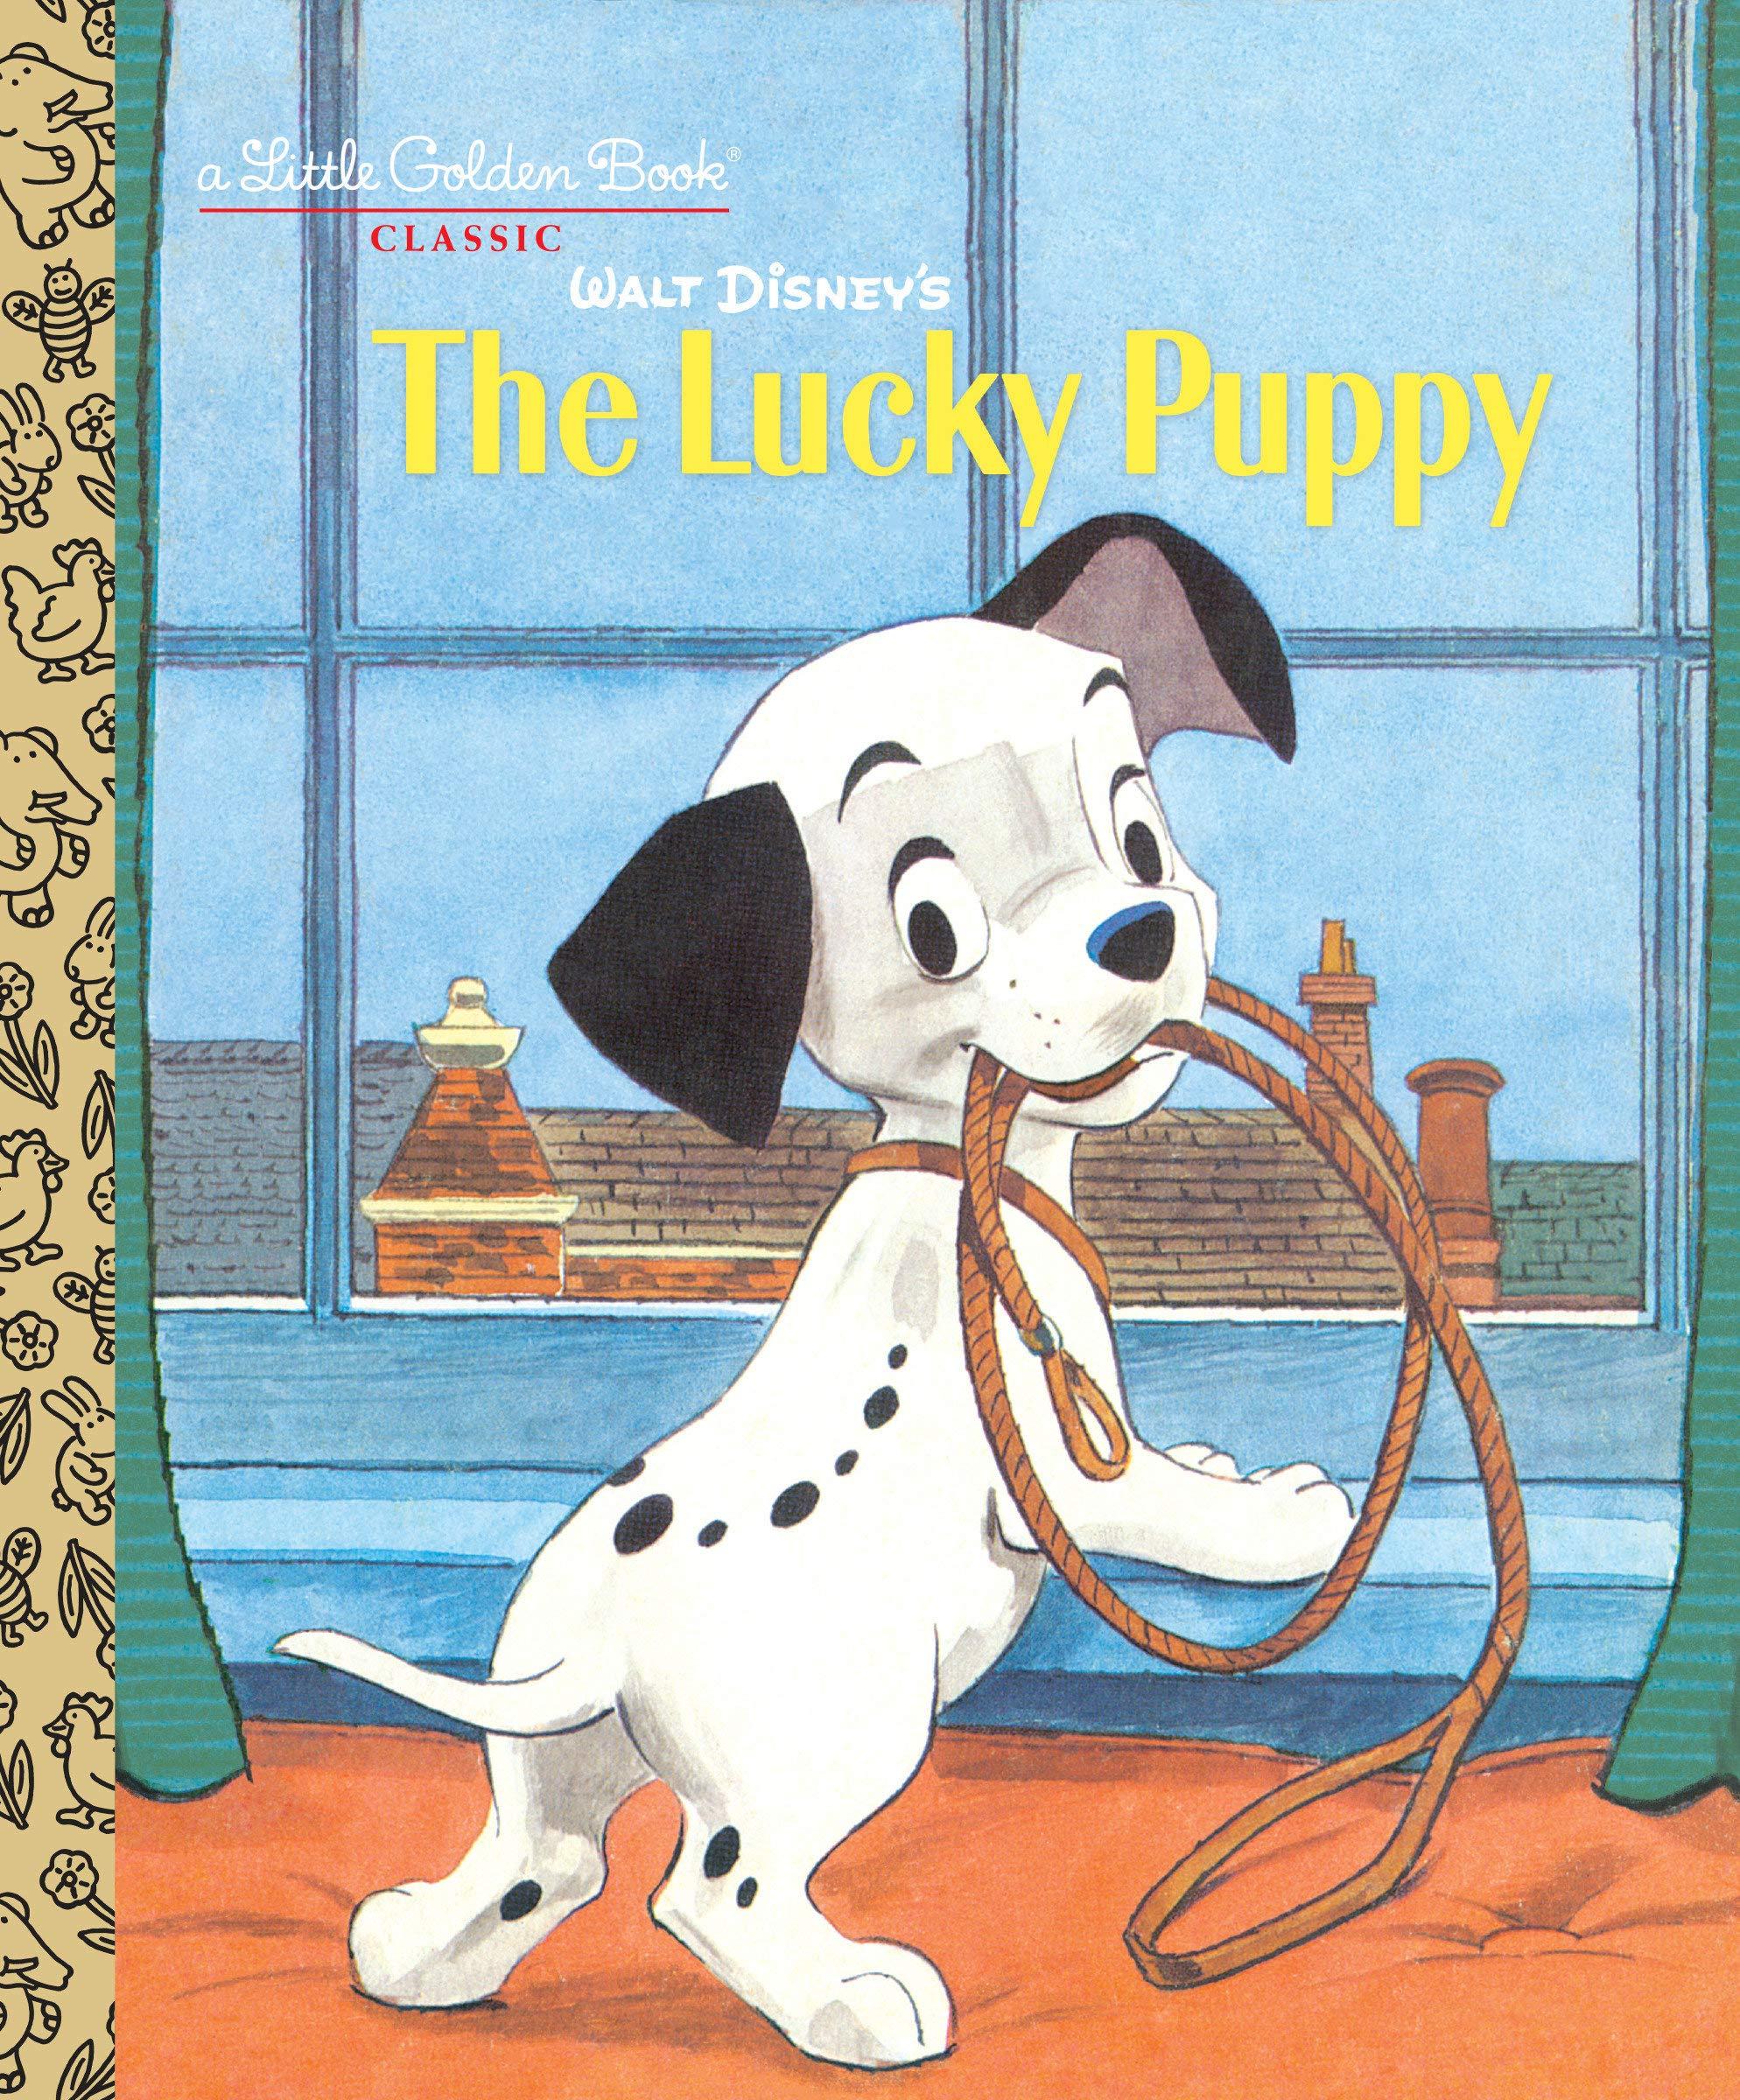 Walt Disney's The Lucky Puppy (Disney Classic) (Little Golden Book): Watson, Jane Werner, Walt Disney Studio, Hubbard, Allen, Bestor, Don: 9780736436861: Amazon.com: Books